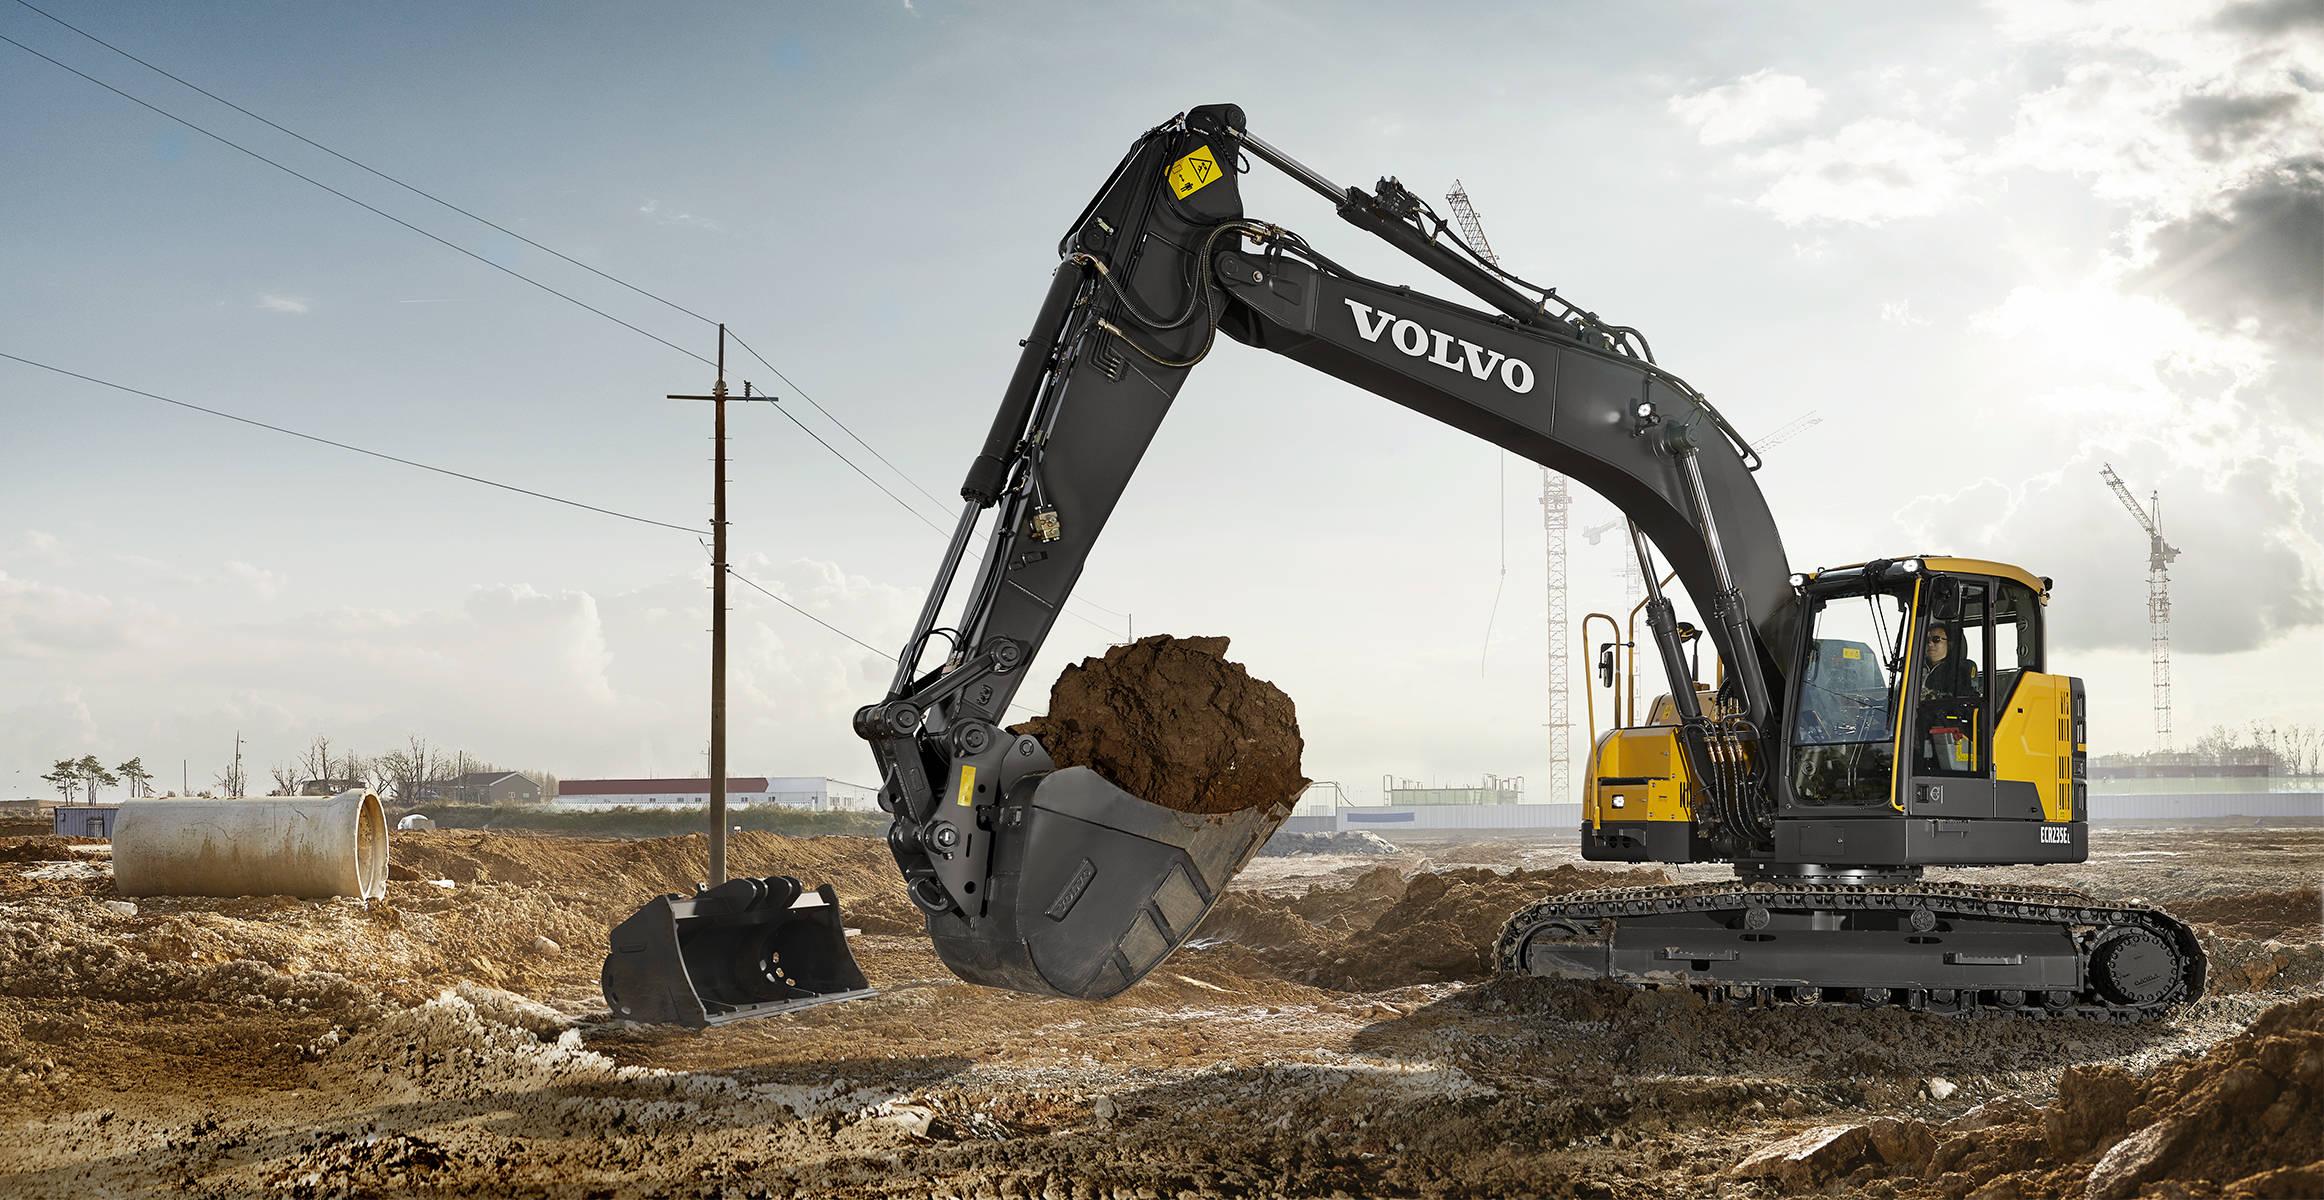 ECR235E | Crawler Excavators | Media gallery | Volvo Construction Equipment